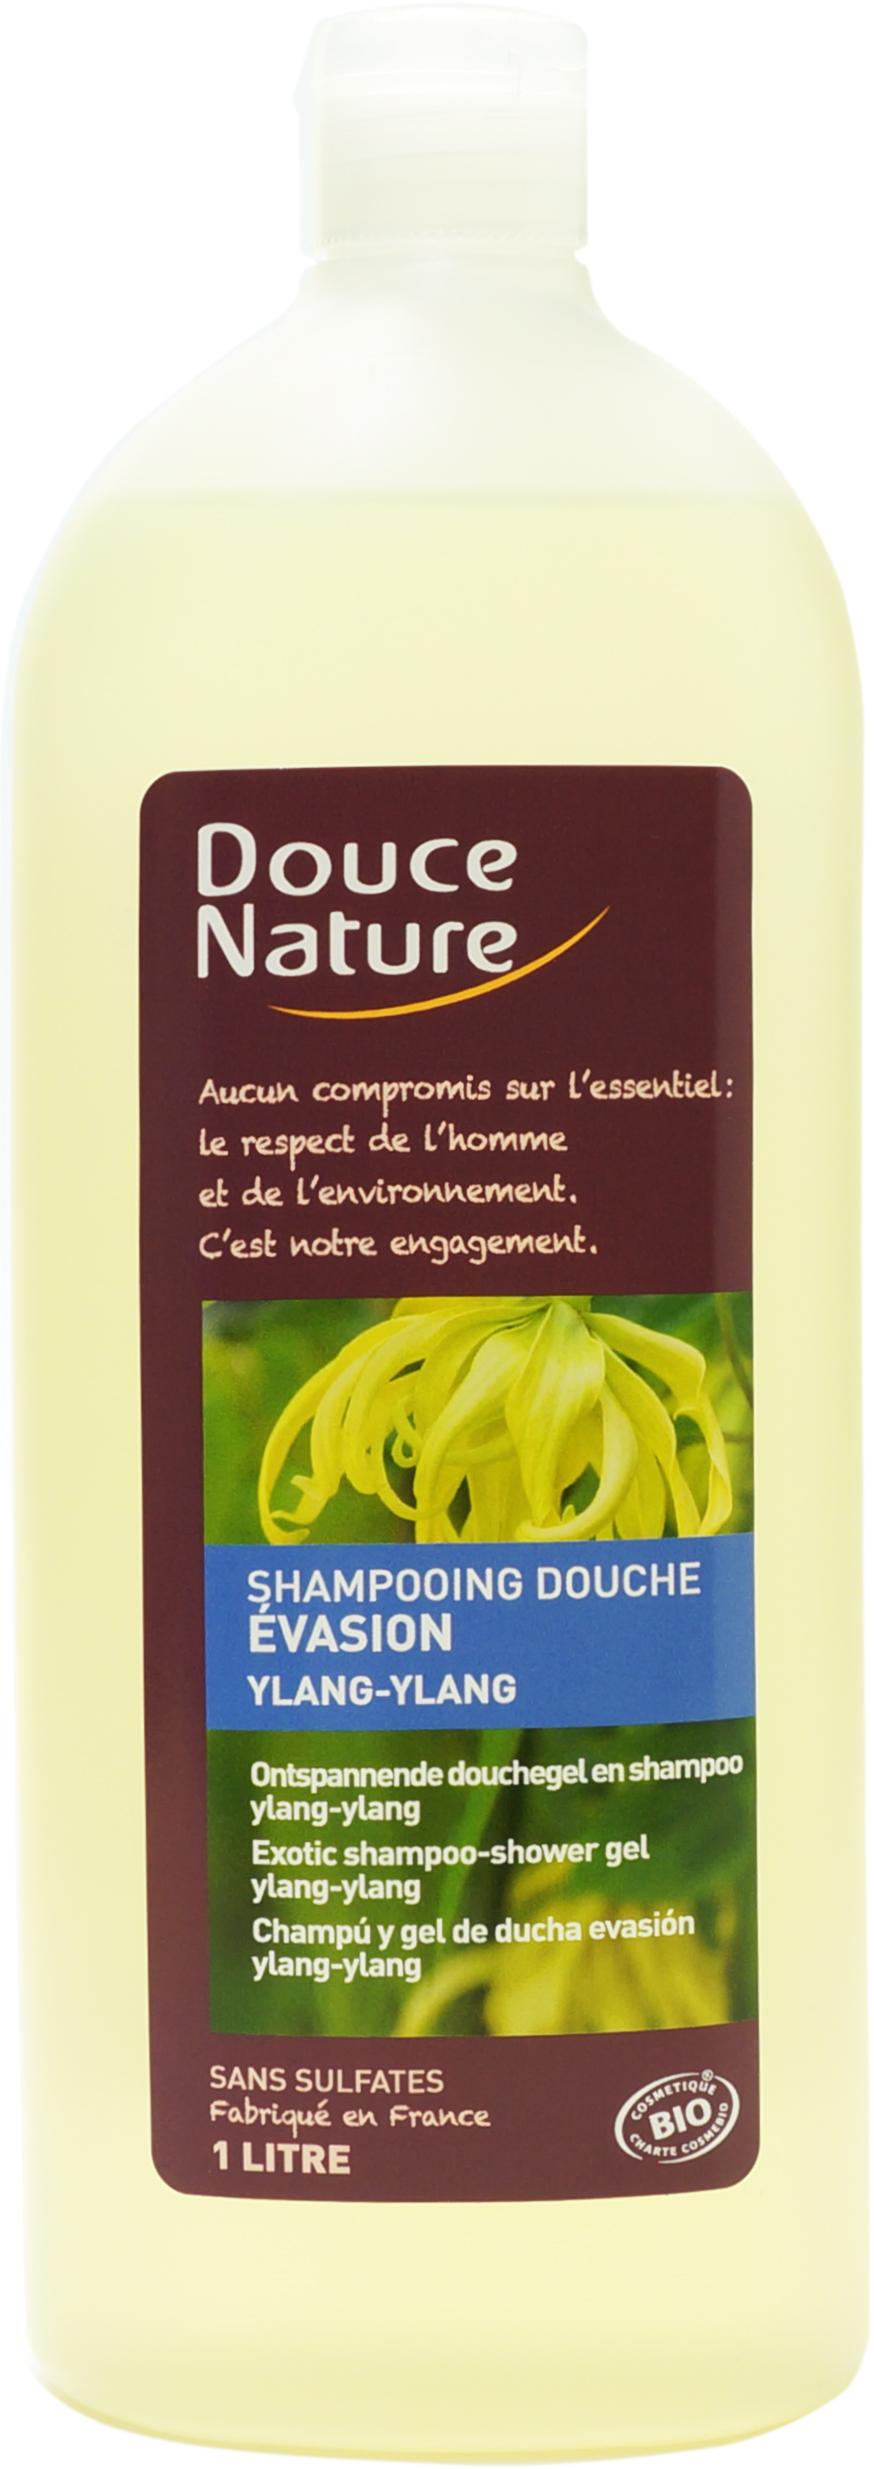 Shampooing-douche évasion Ylang, Douce Nature (1 L)